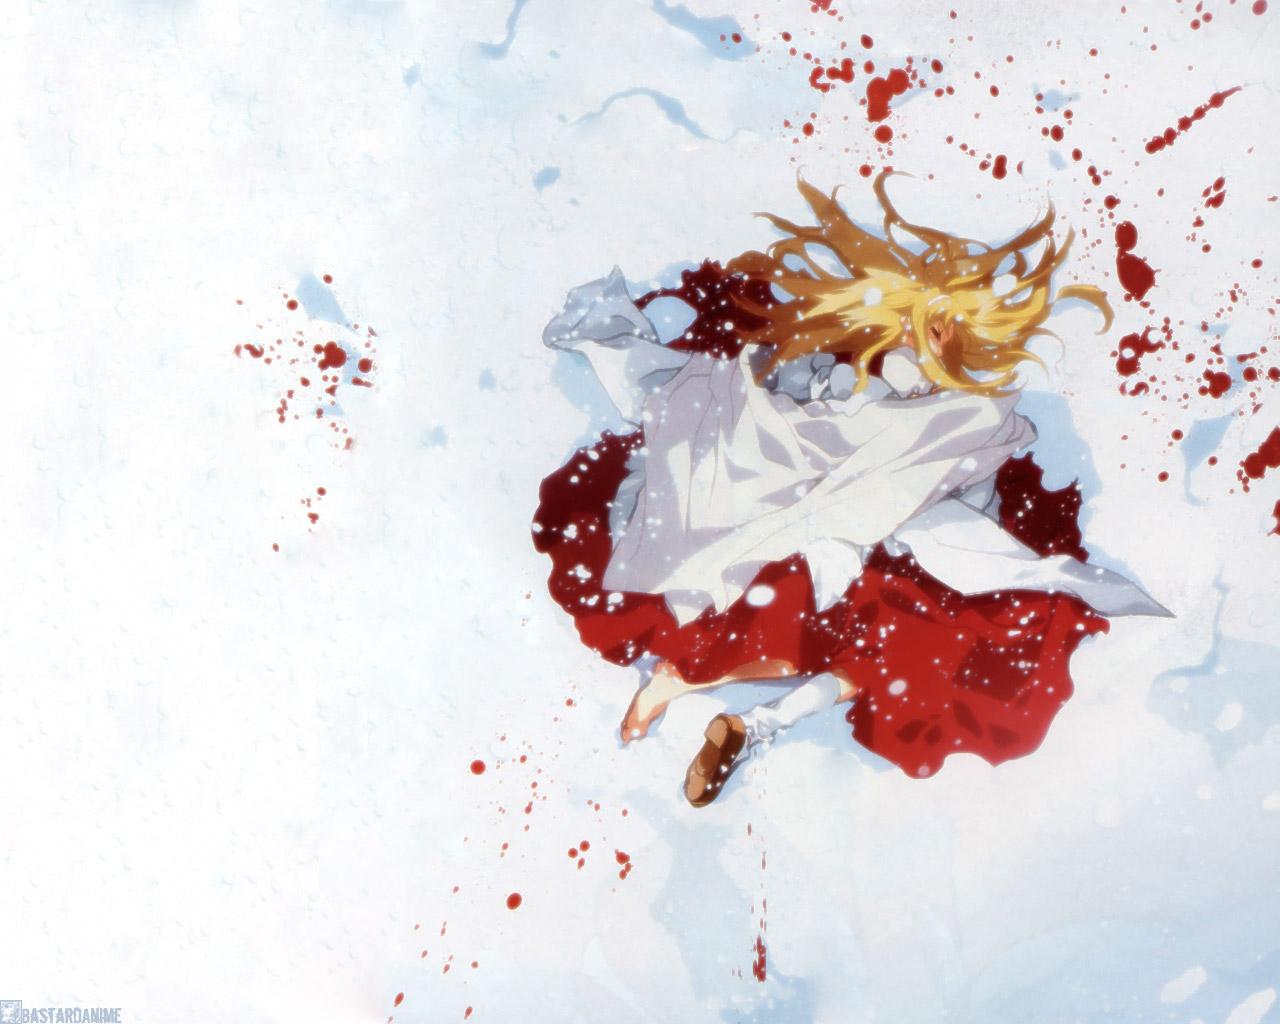 blood dnangel freedert japanese_clothes miko snow sugisaki_yukiru